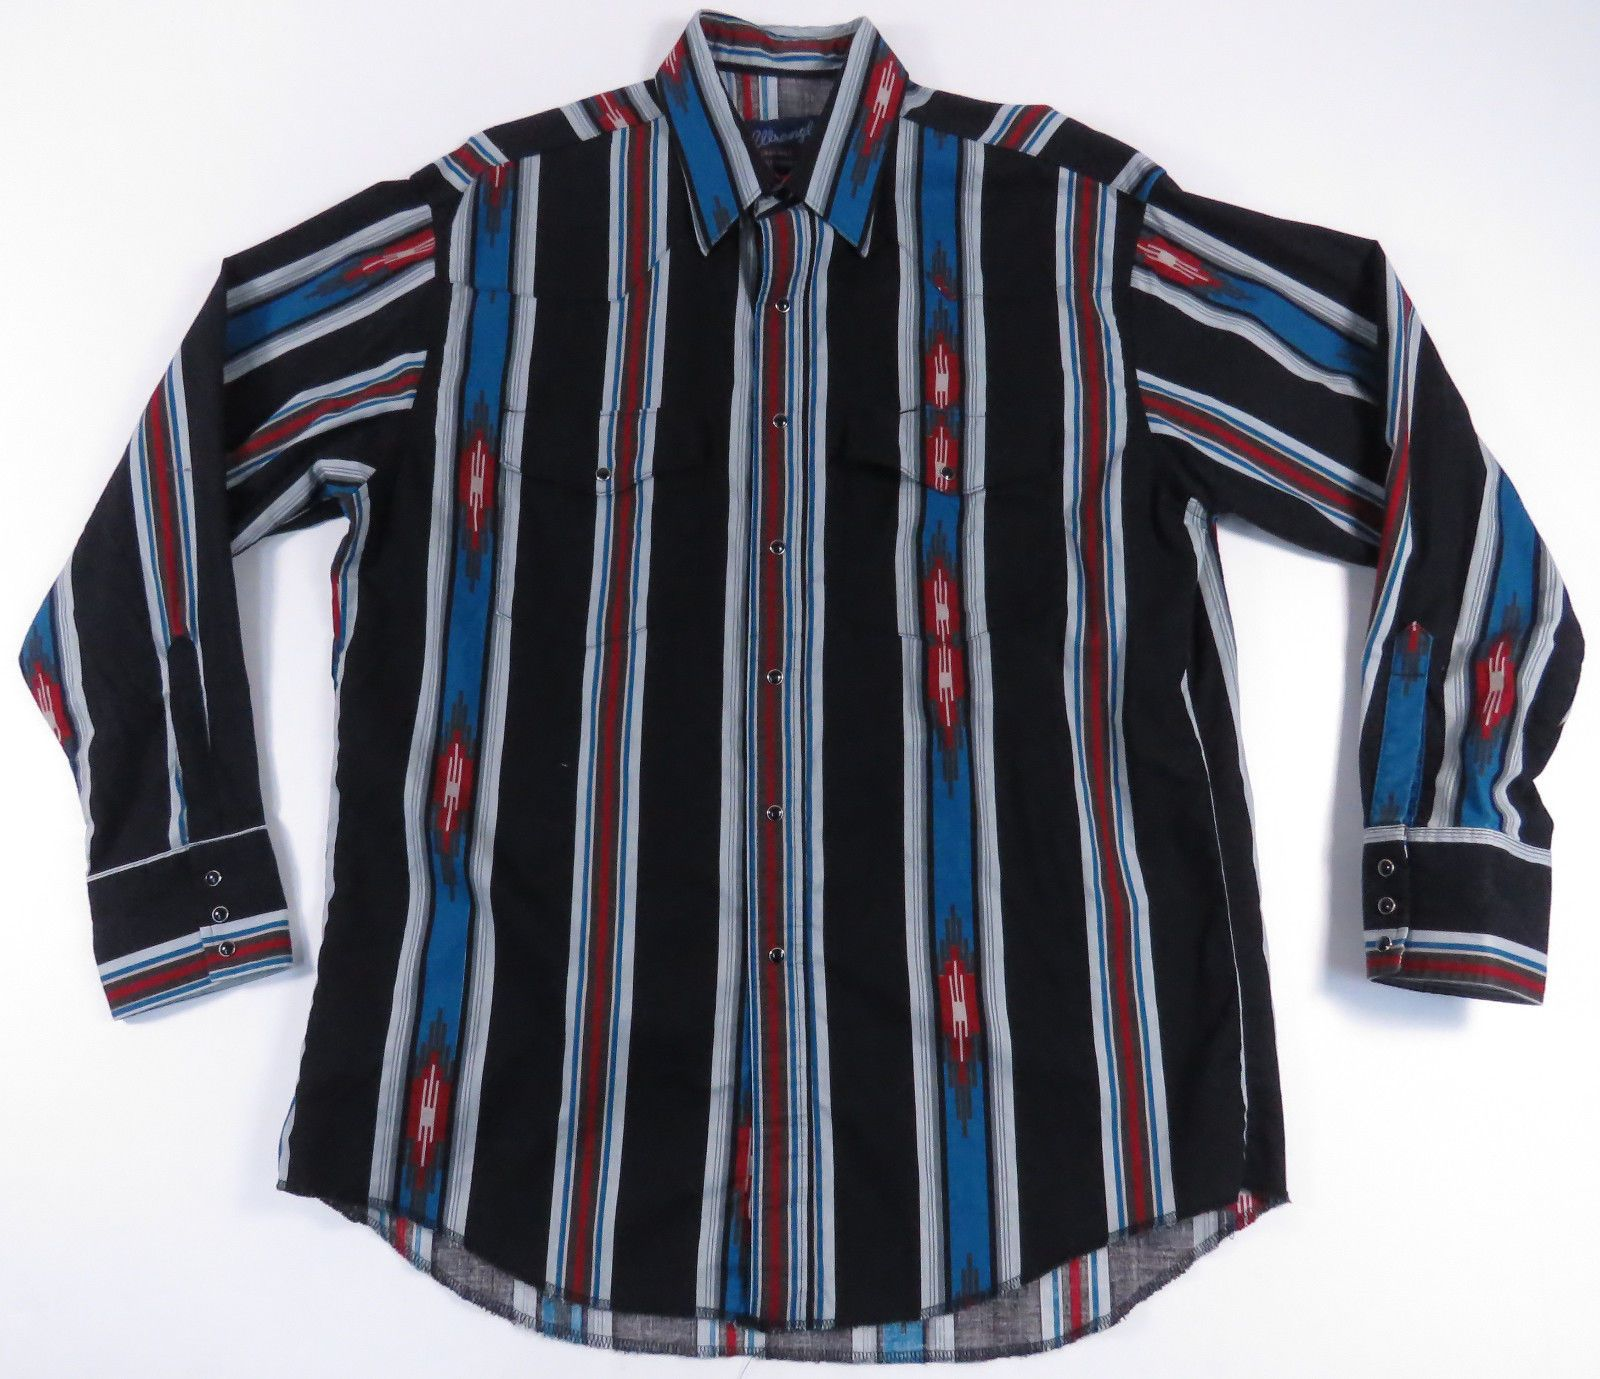 ce63211a5 VTG 80S 90S WRANGLER PEARL SNAP AZTEC STRIPED WESTERN COWBOY SHIRT RODEO  EUC L Rodeo Clothes